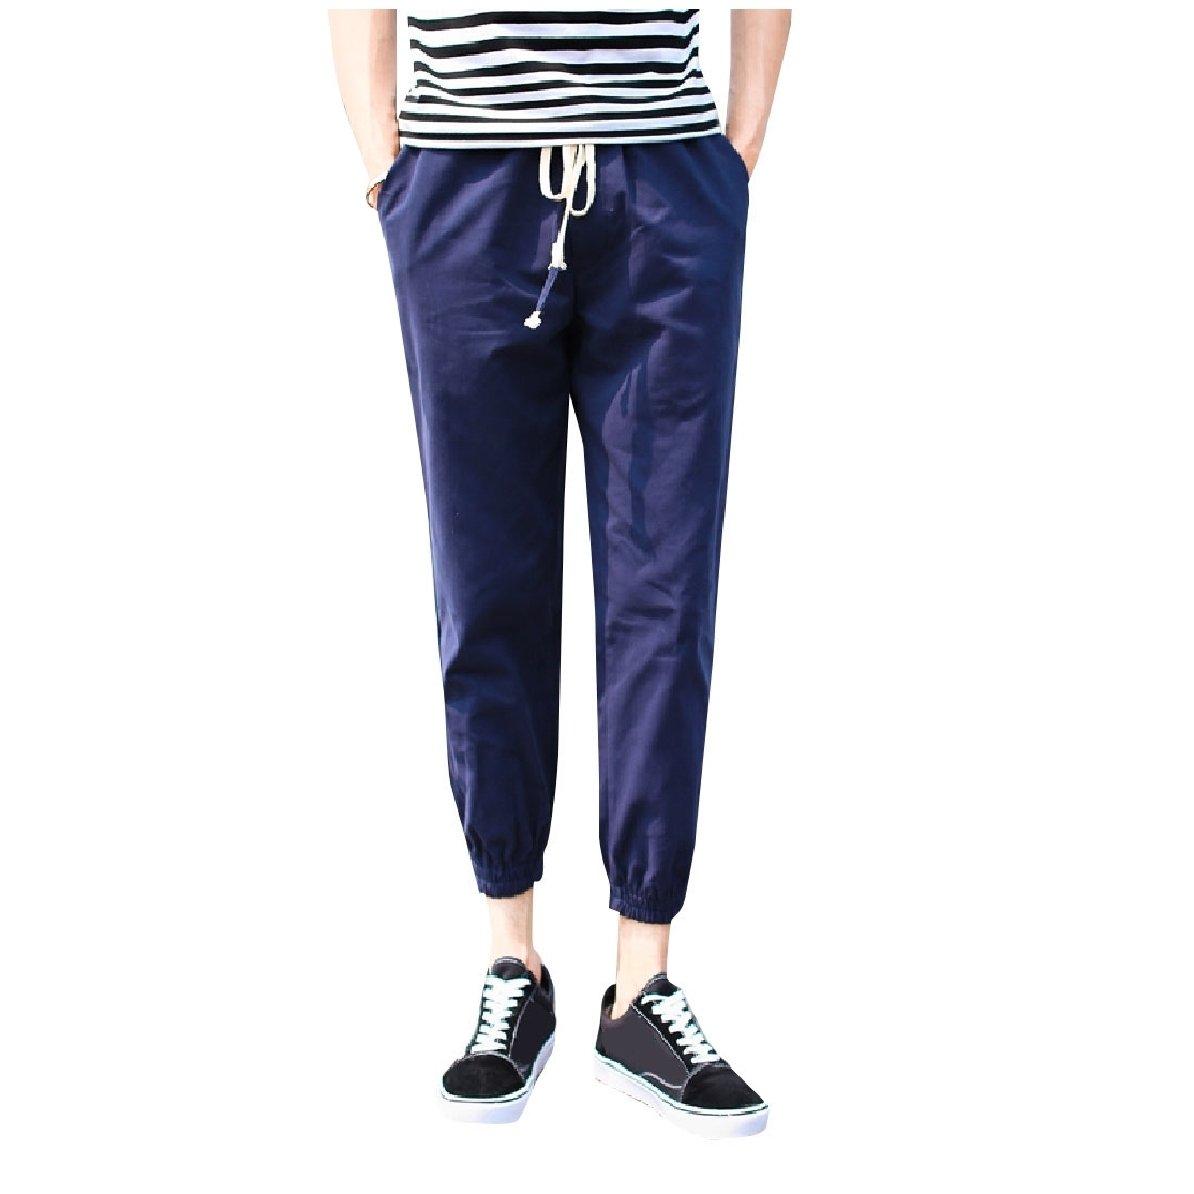 YUNY Men Elastic Waist Beam Foot Trousers Tenths Pants Navy Blue 2XL